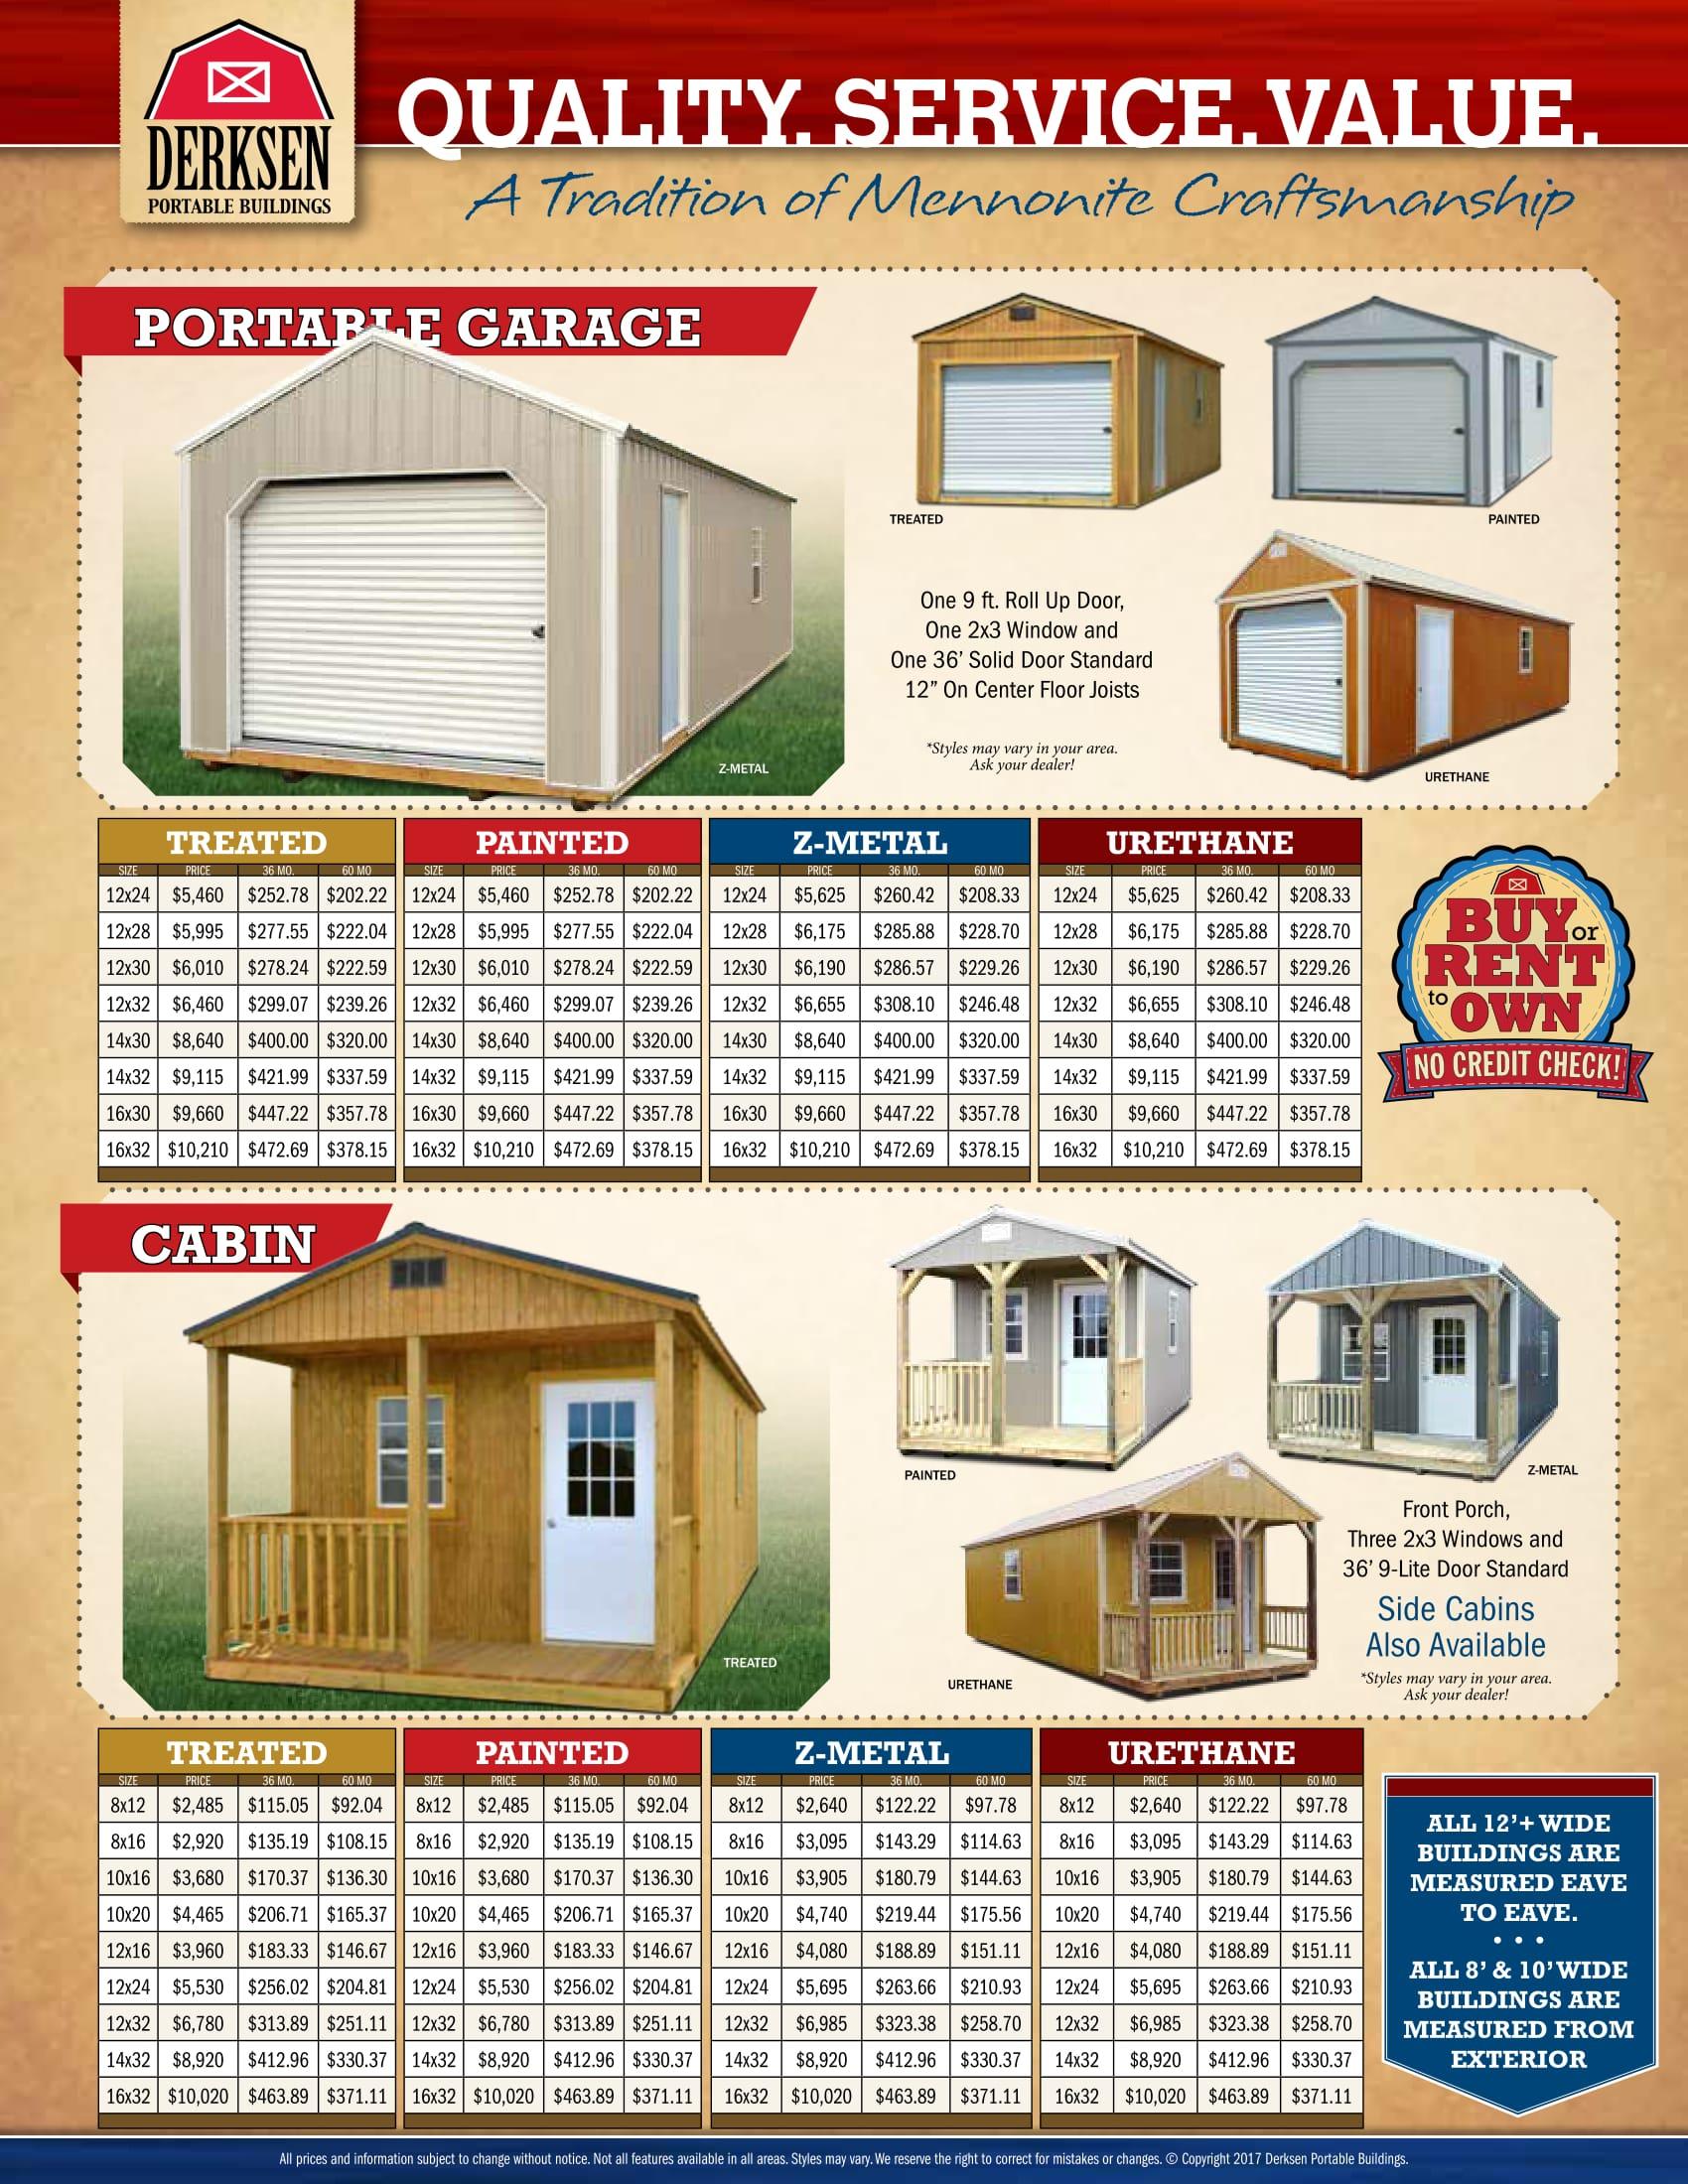 Derksen Portable Buildings Prices